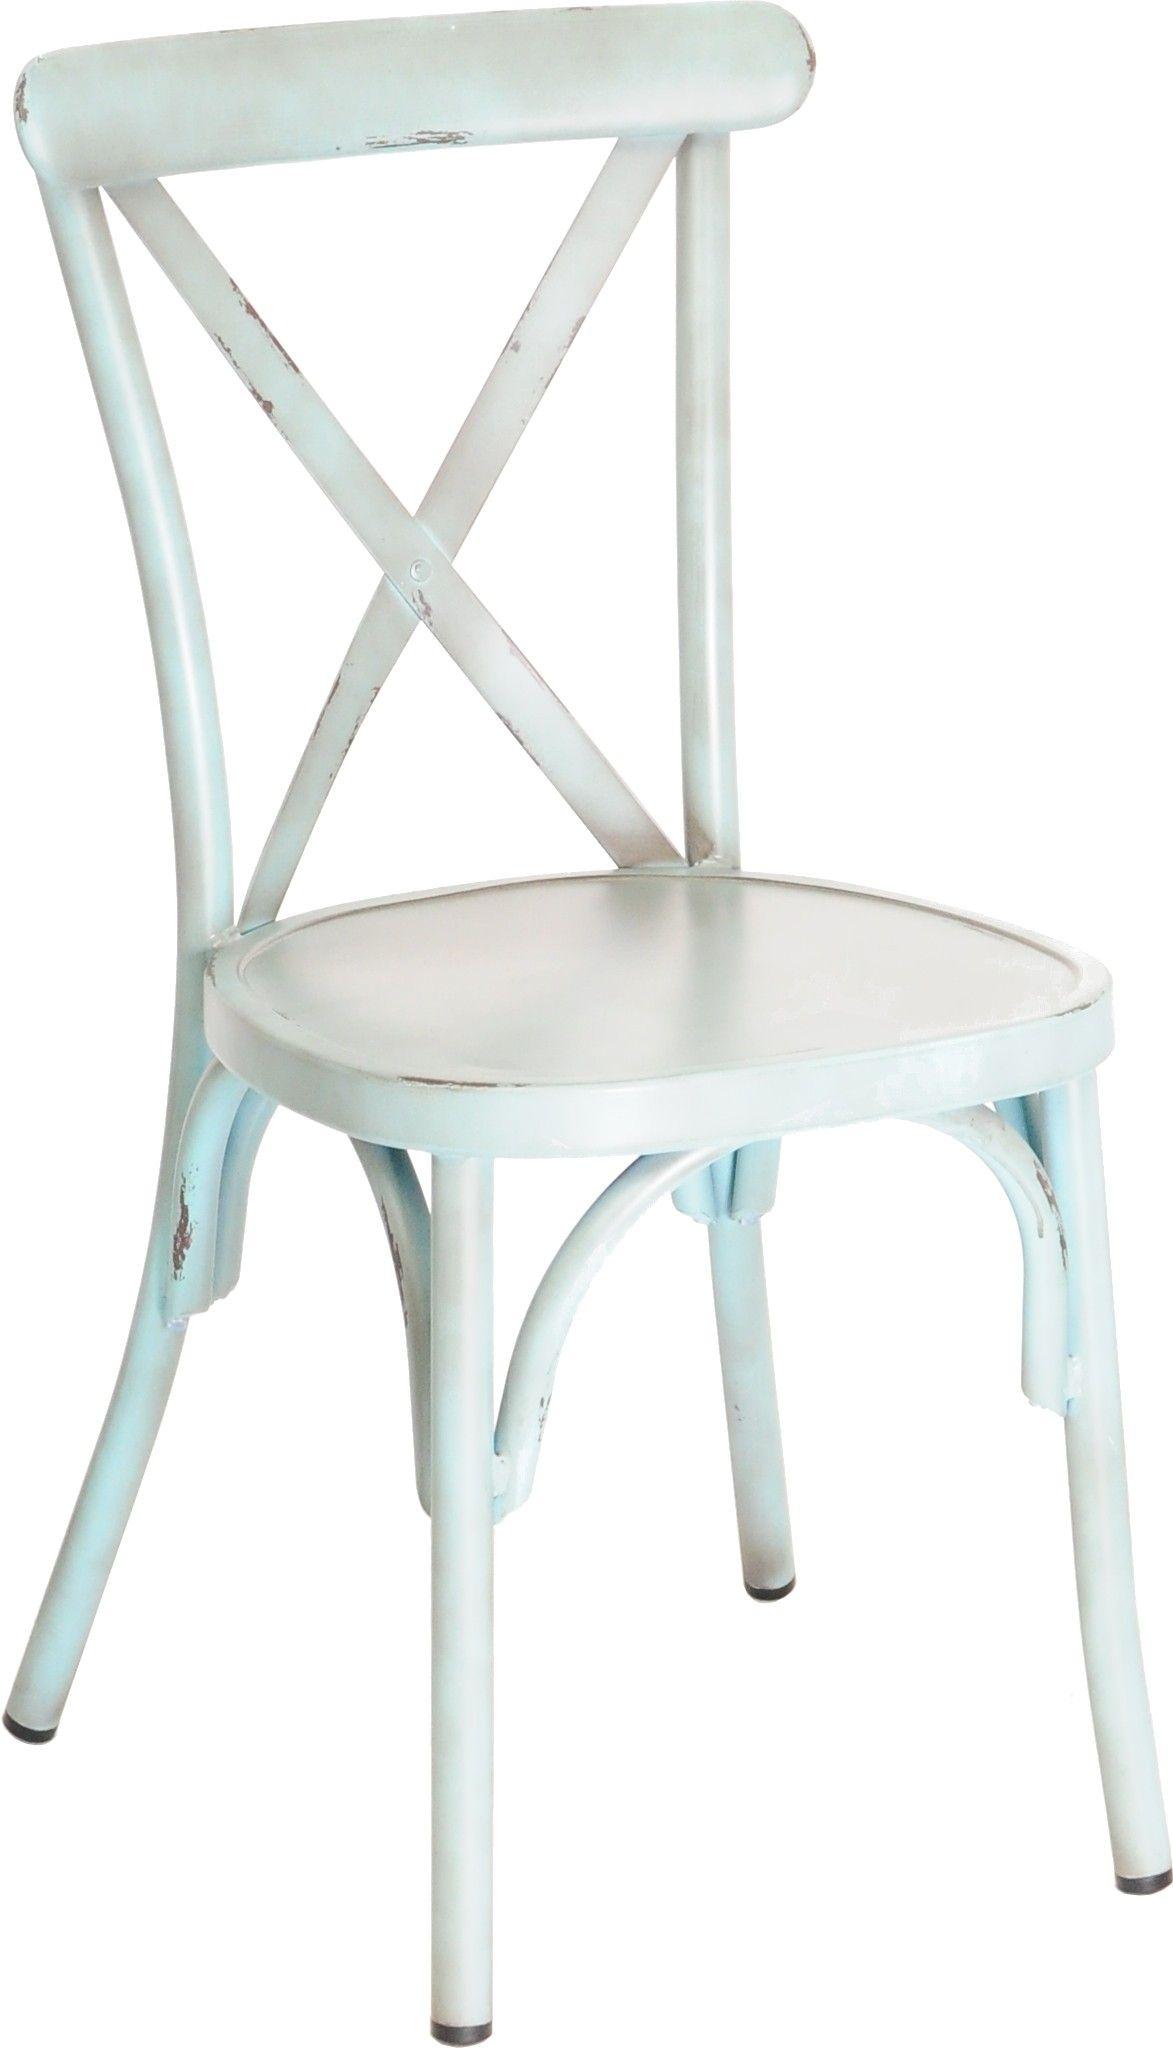 Chaise Cross Aluminium Empilable Finition Vintage Bleu Chaise Restaurant Chaise Terrasse Chaise